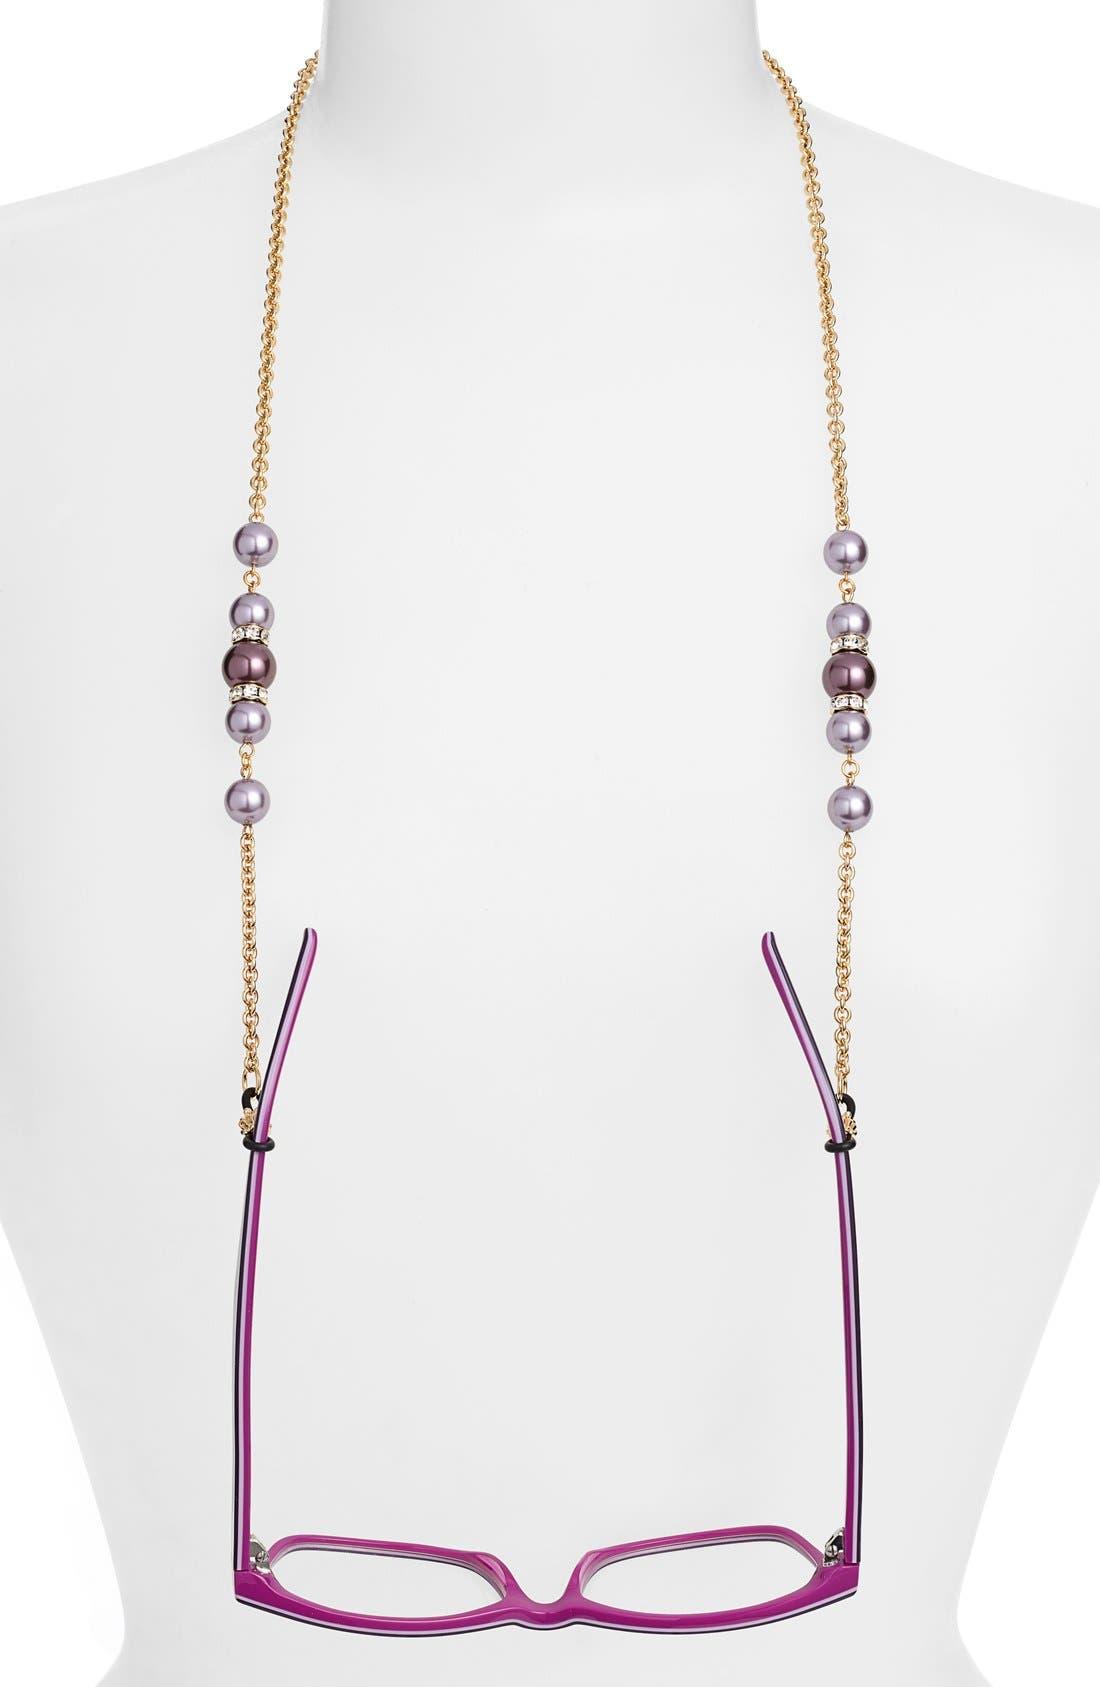 'Cadabra' Swarovski Crystal Eyeglass Chain,                         Main,                         color, Burgundy/ Gold